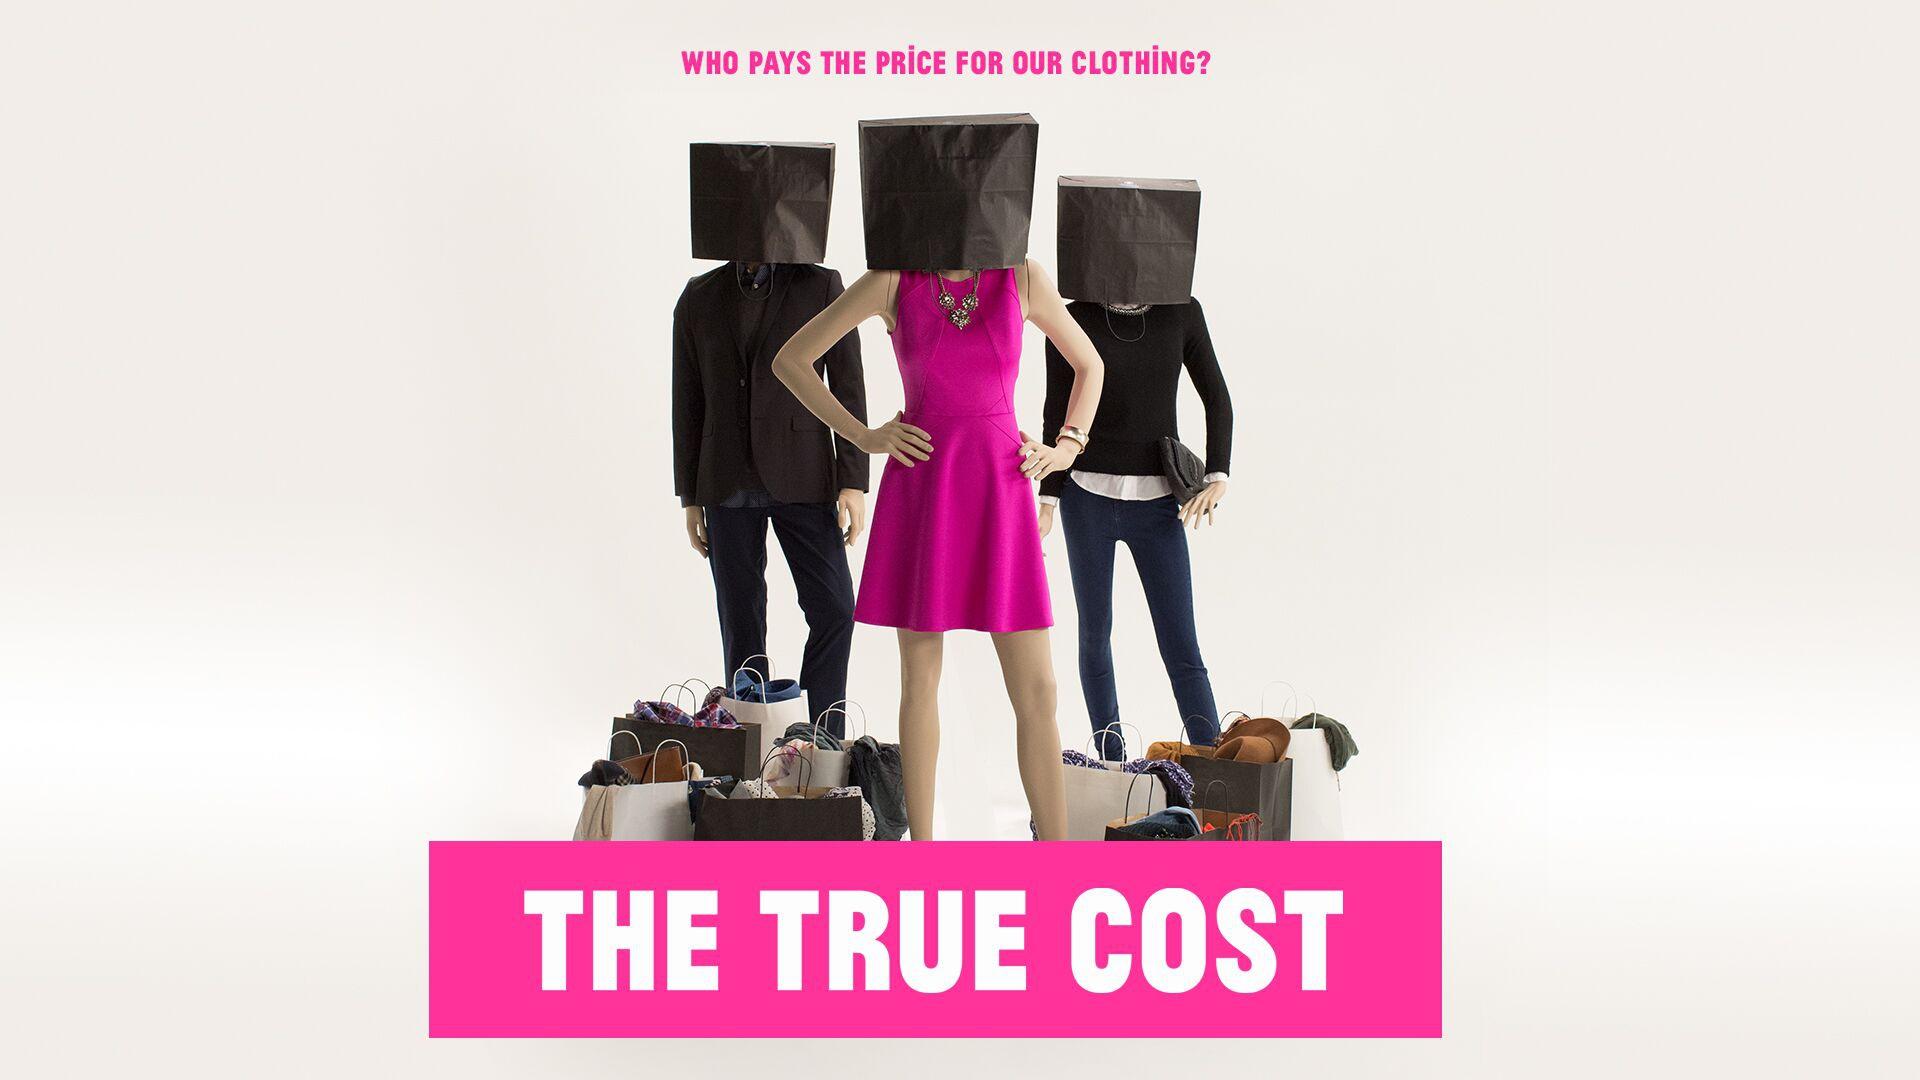 The True Cost: ต้นทุนที่แสนเจ็บปวด..อุตสาหกรรมเสื้อผ้าและแฟชั่นทำร้ายอะไรบ้าง?